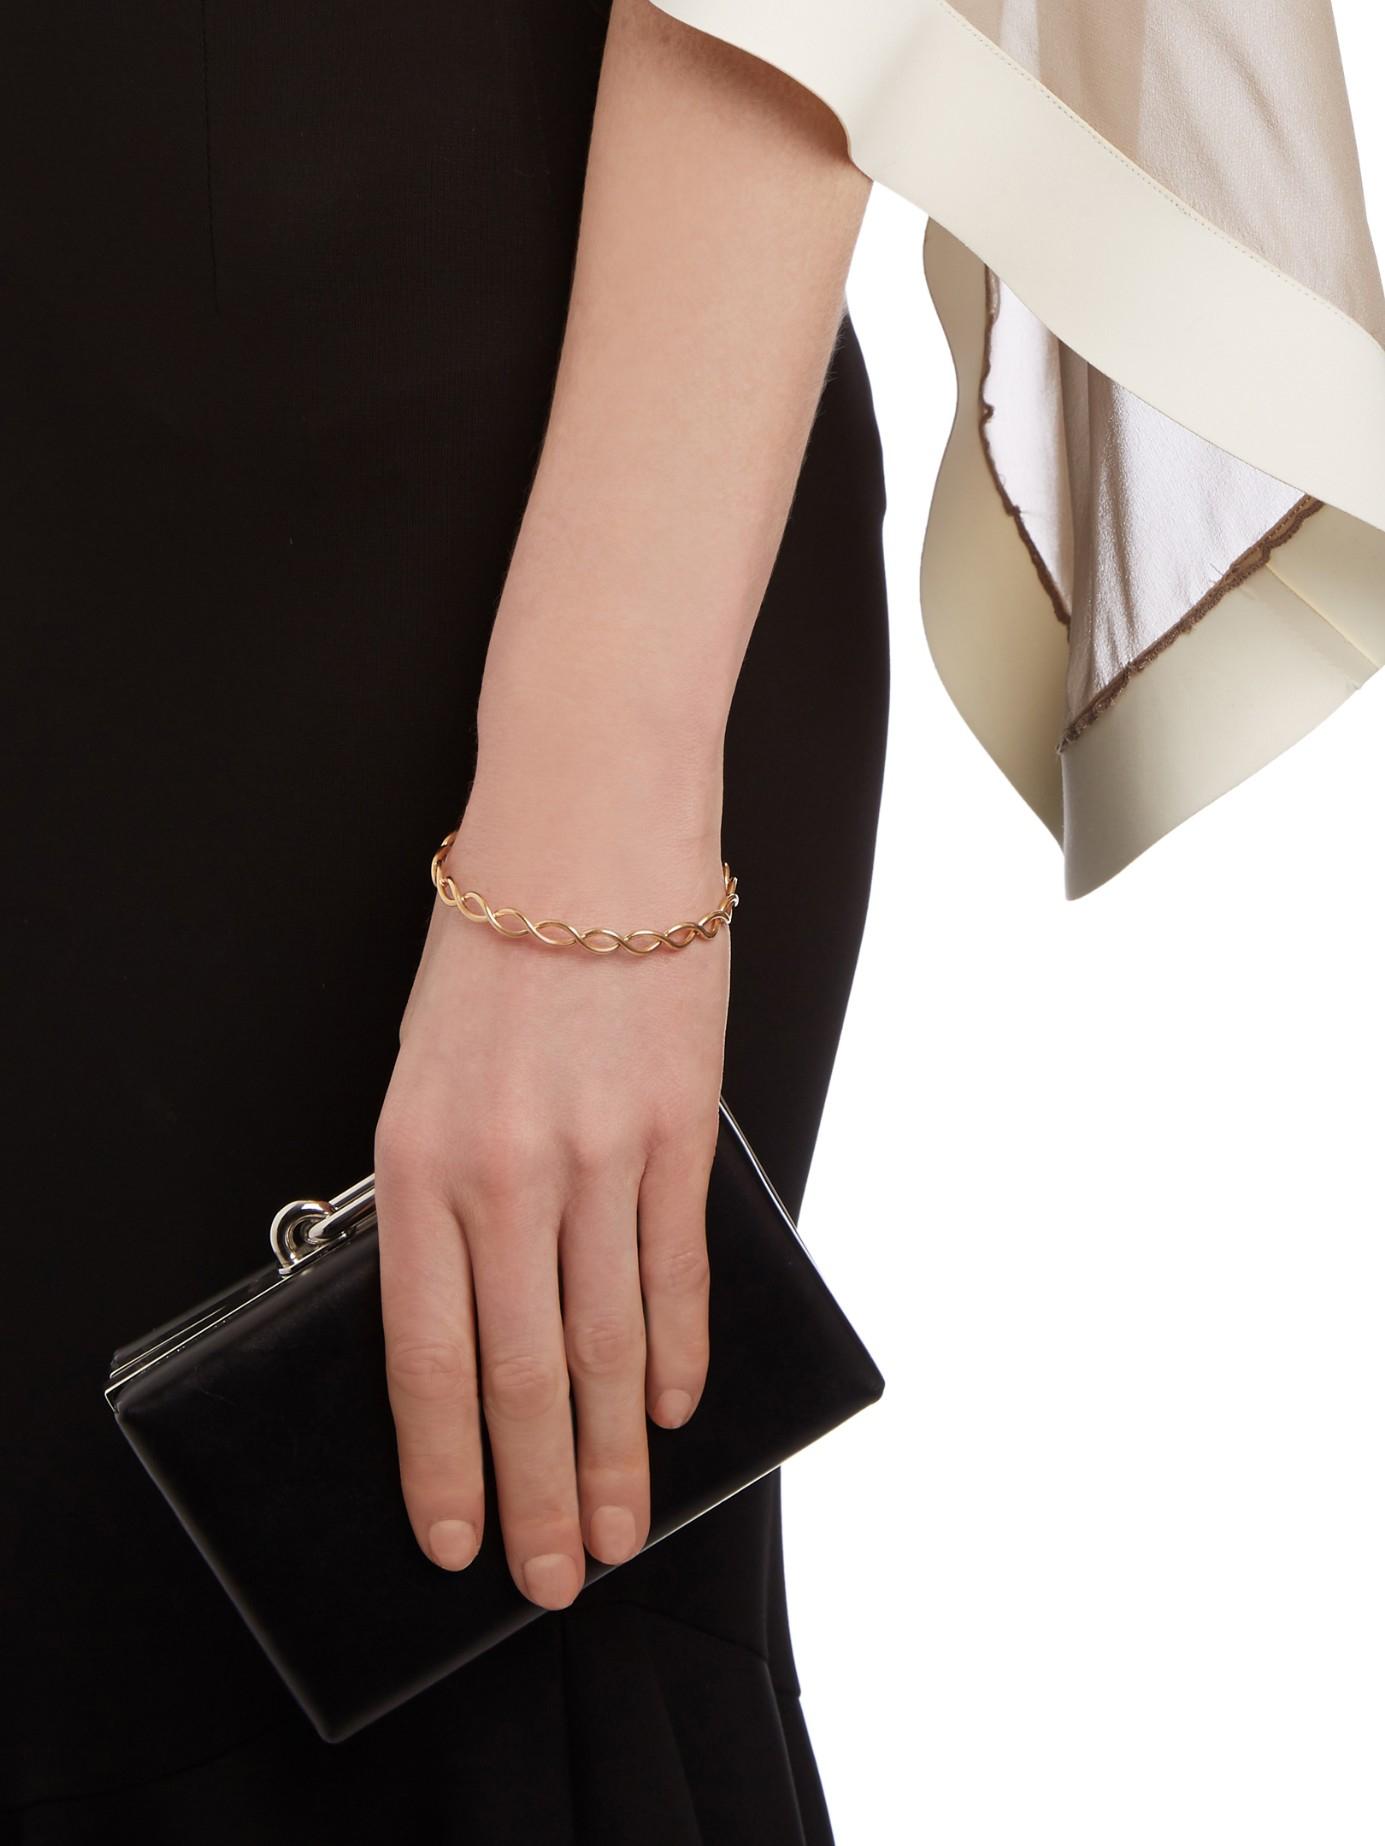 Irene Neuwirth Rose-gold Braided Bangle in Rose Gold (Metallic)